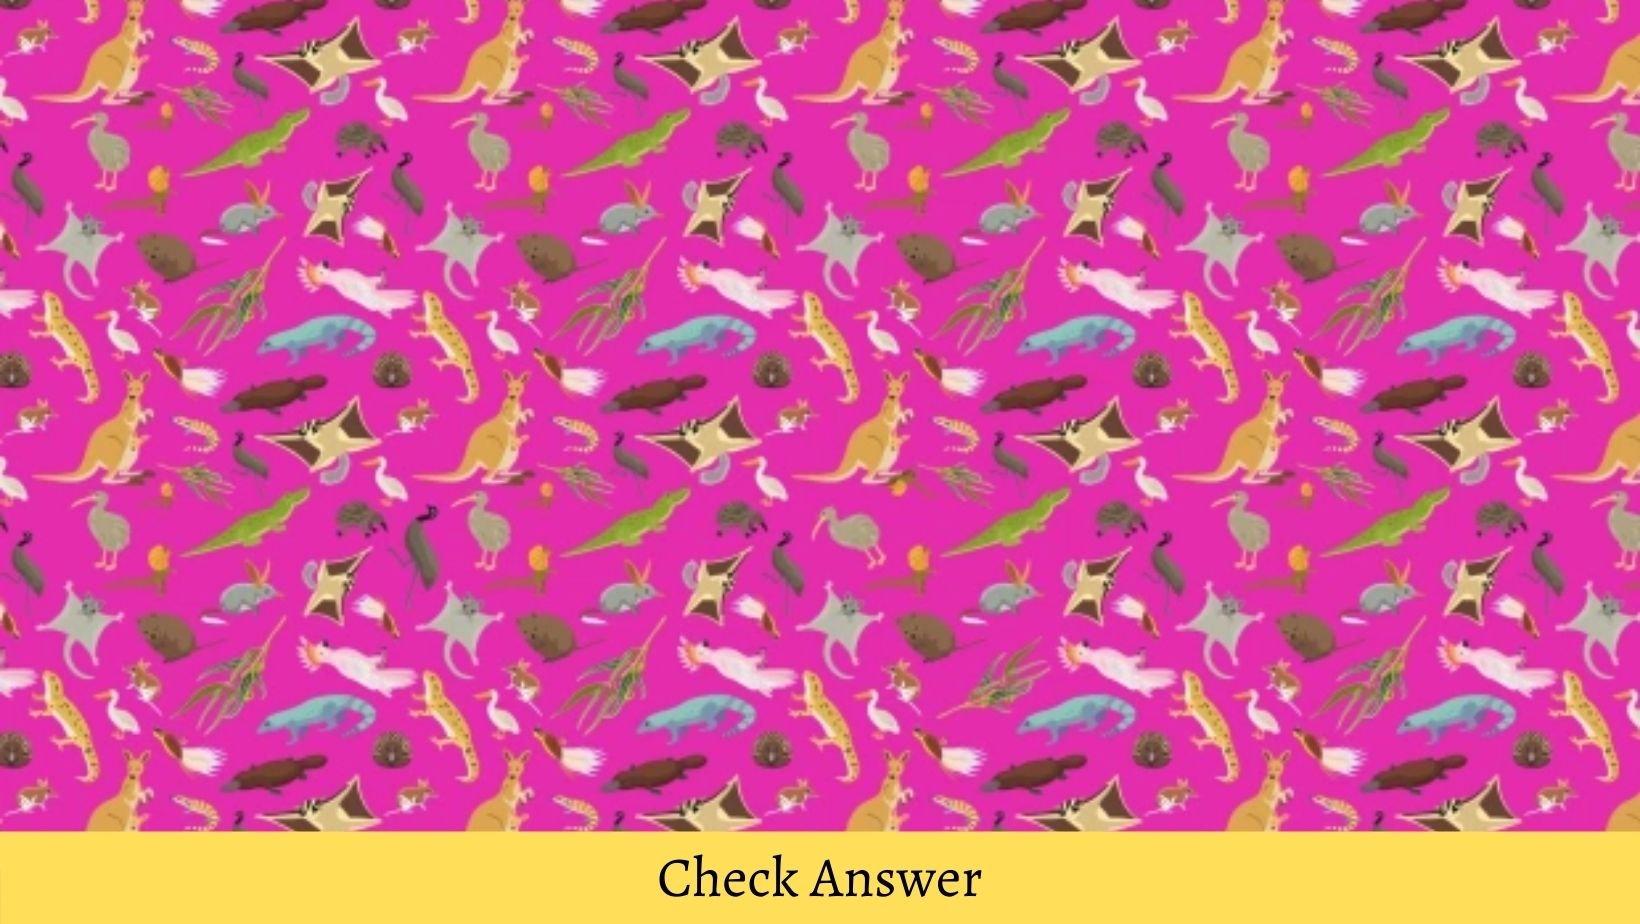 small joys thumbnail 4 3.jpg?resize=1200,630 - VISUAL TEST: Can You Spot The KOALA In Less Than A Minute?